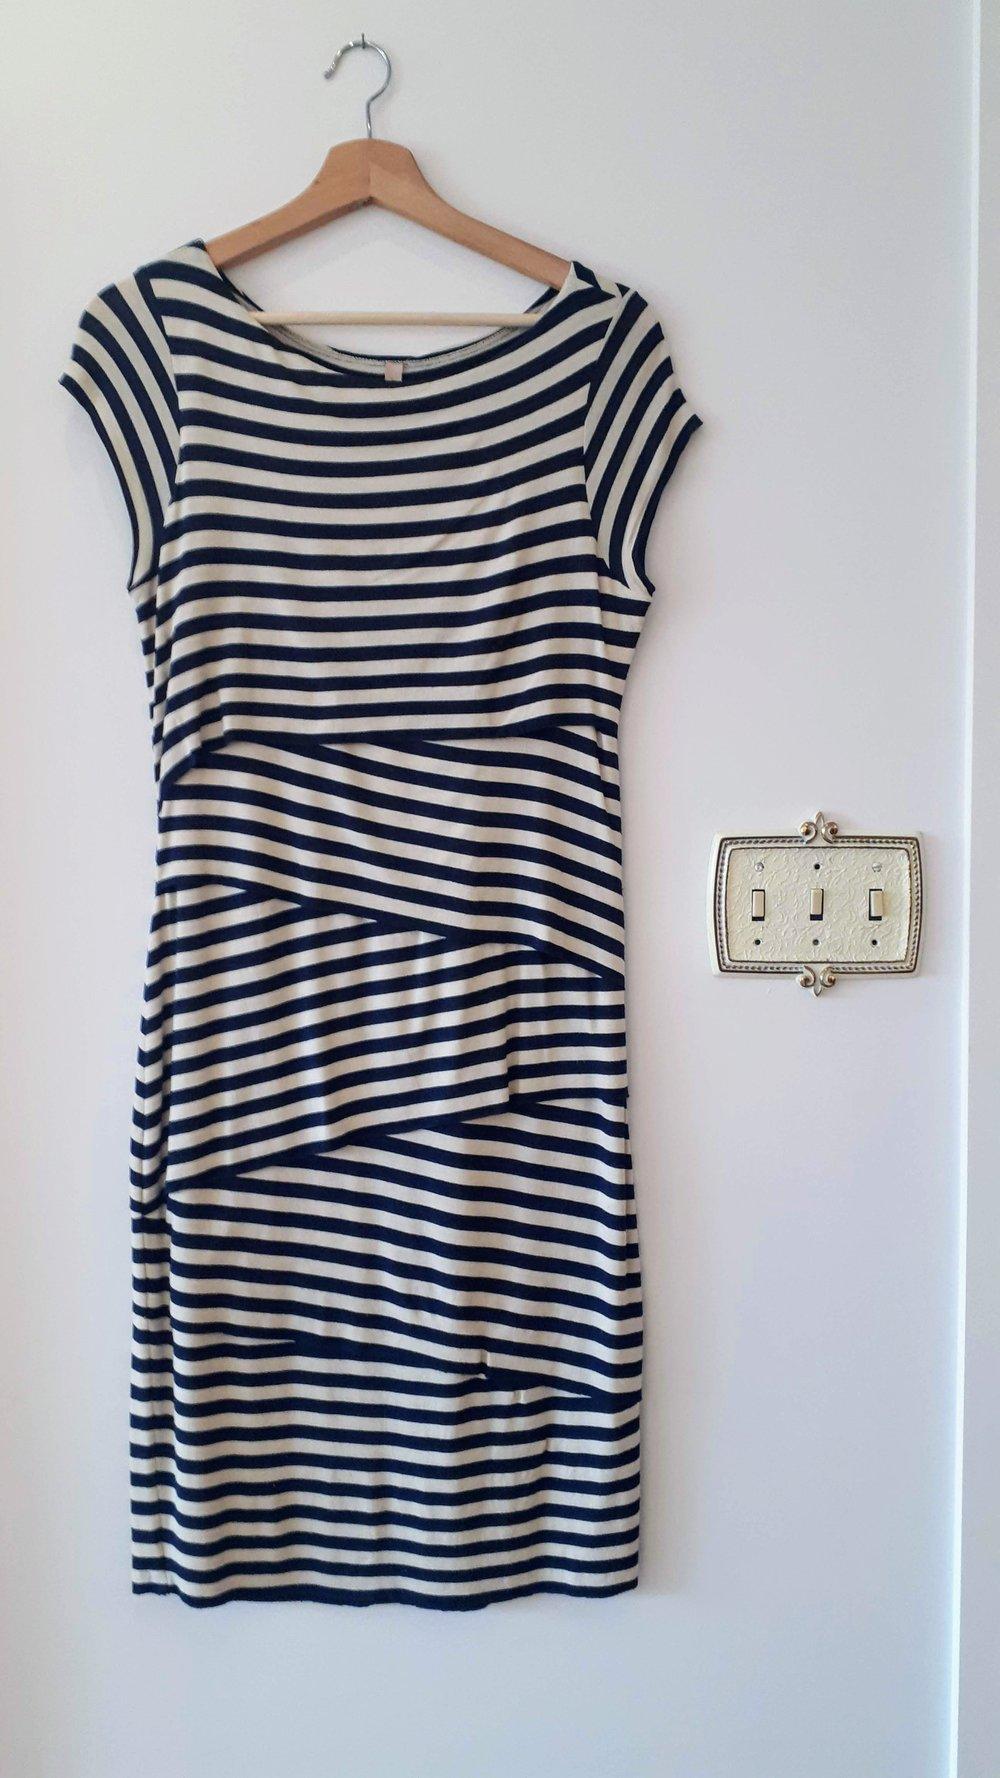 Bailey 44 dress; Size L, $36